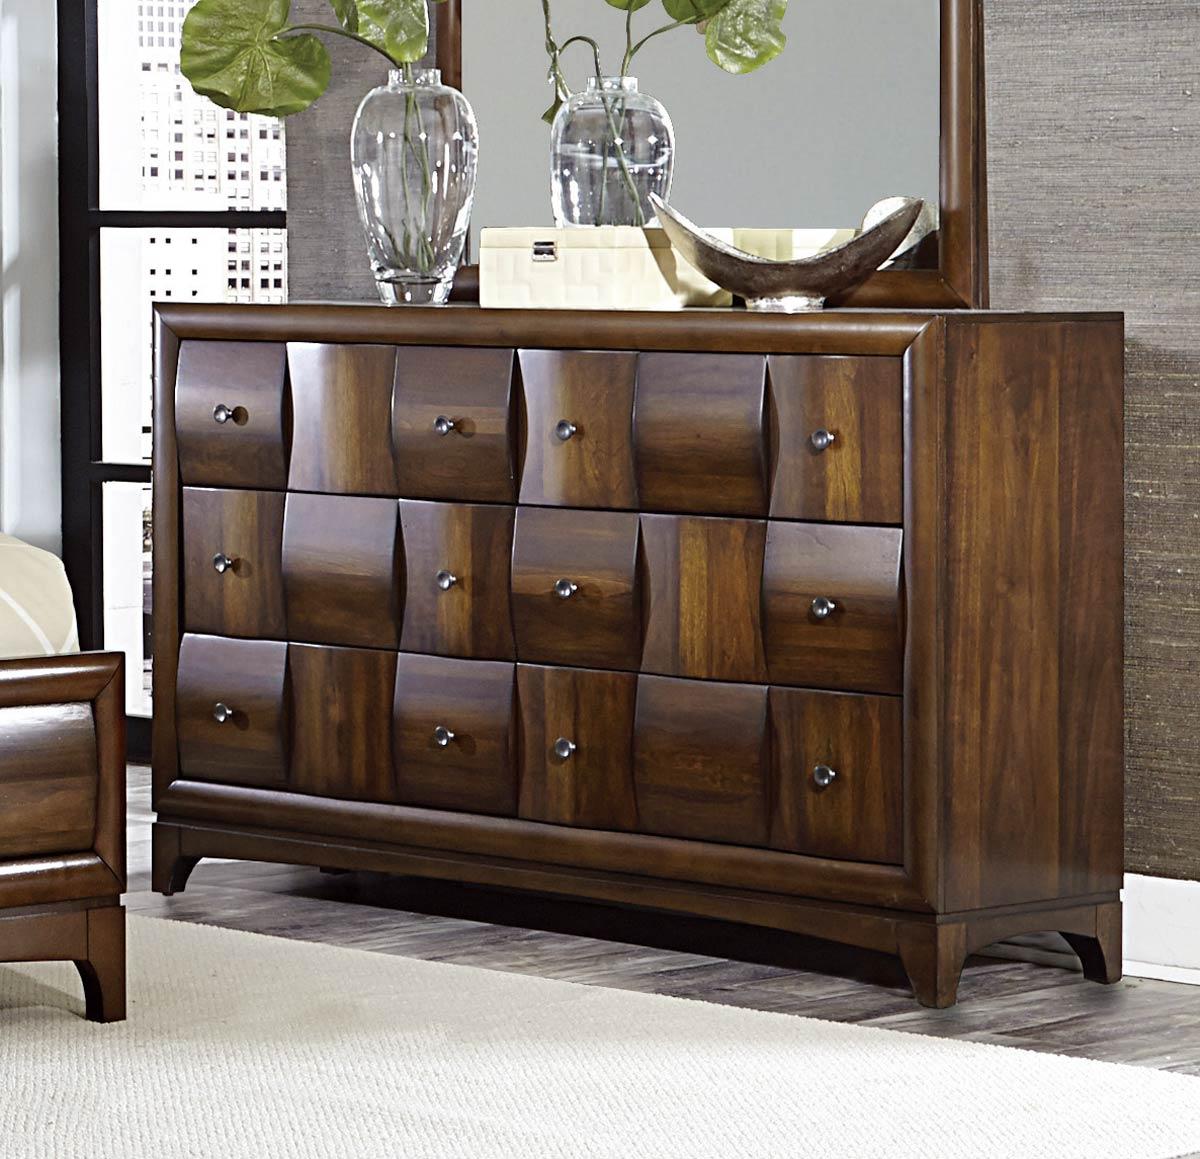 Homelegance Porter Dresser - Warm Walnut